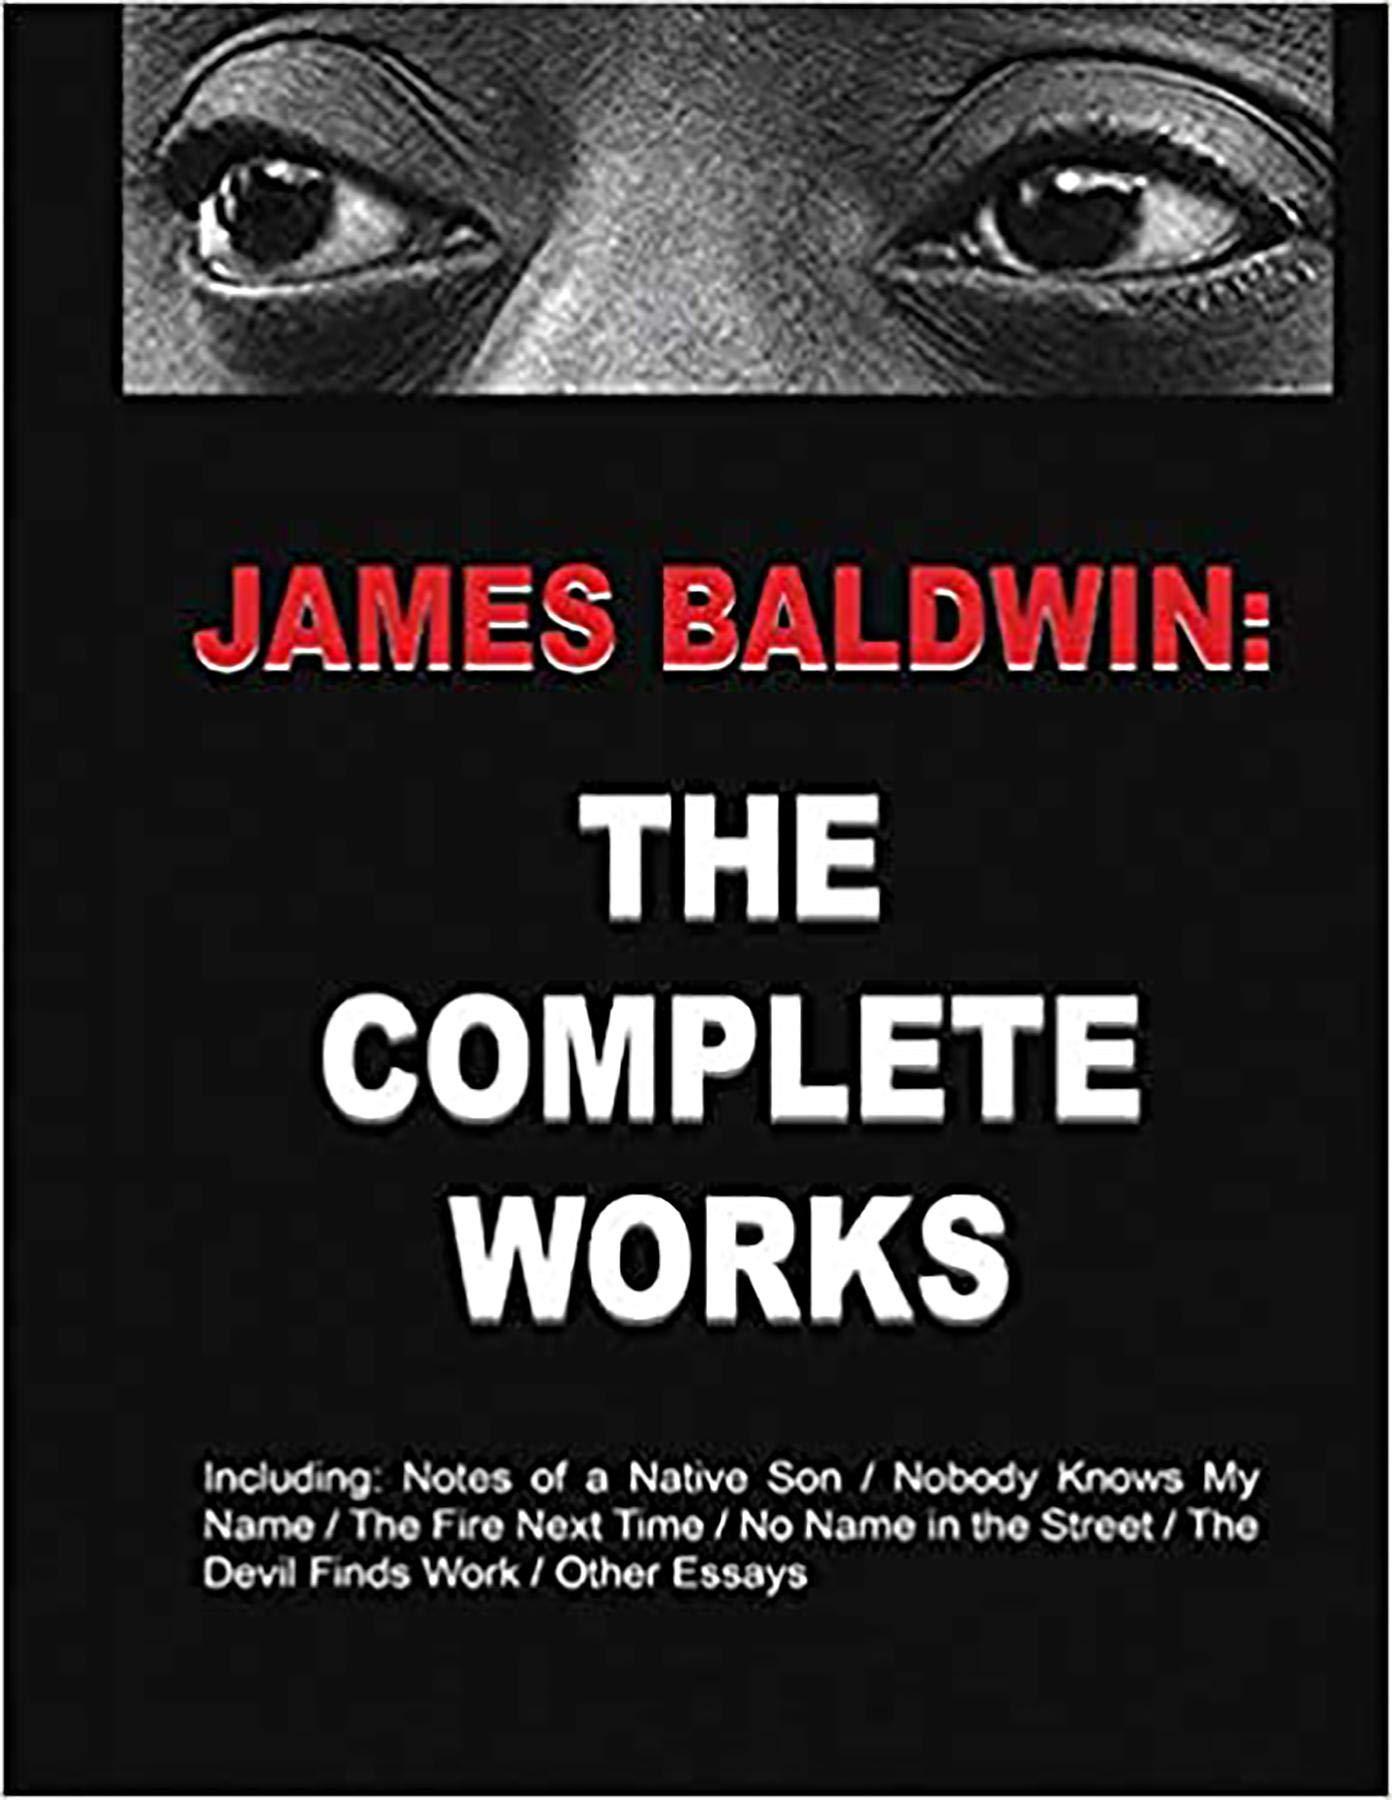 James Baldwin: The Complete Works